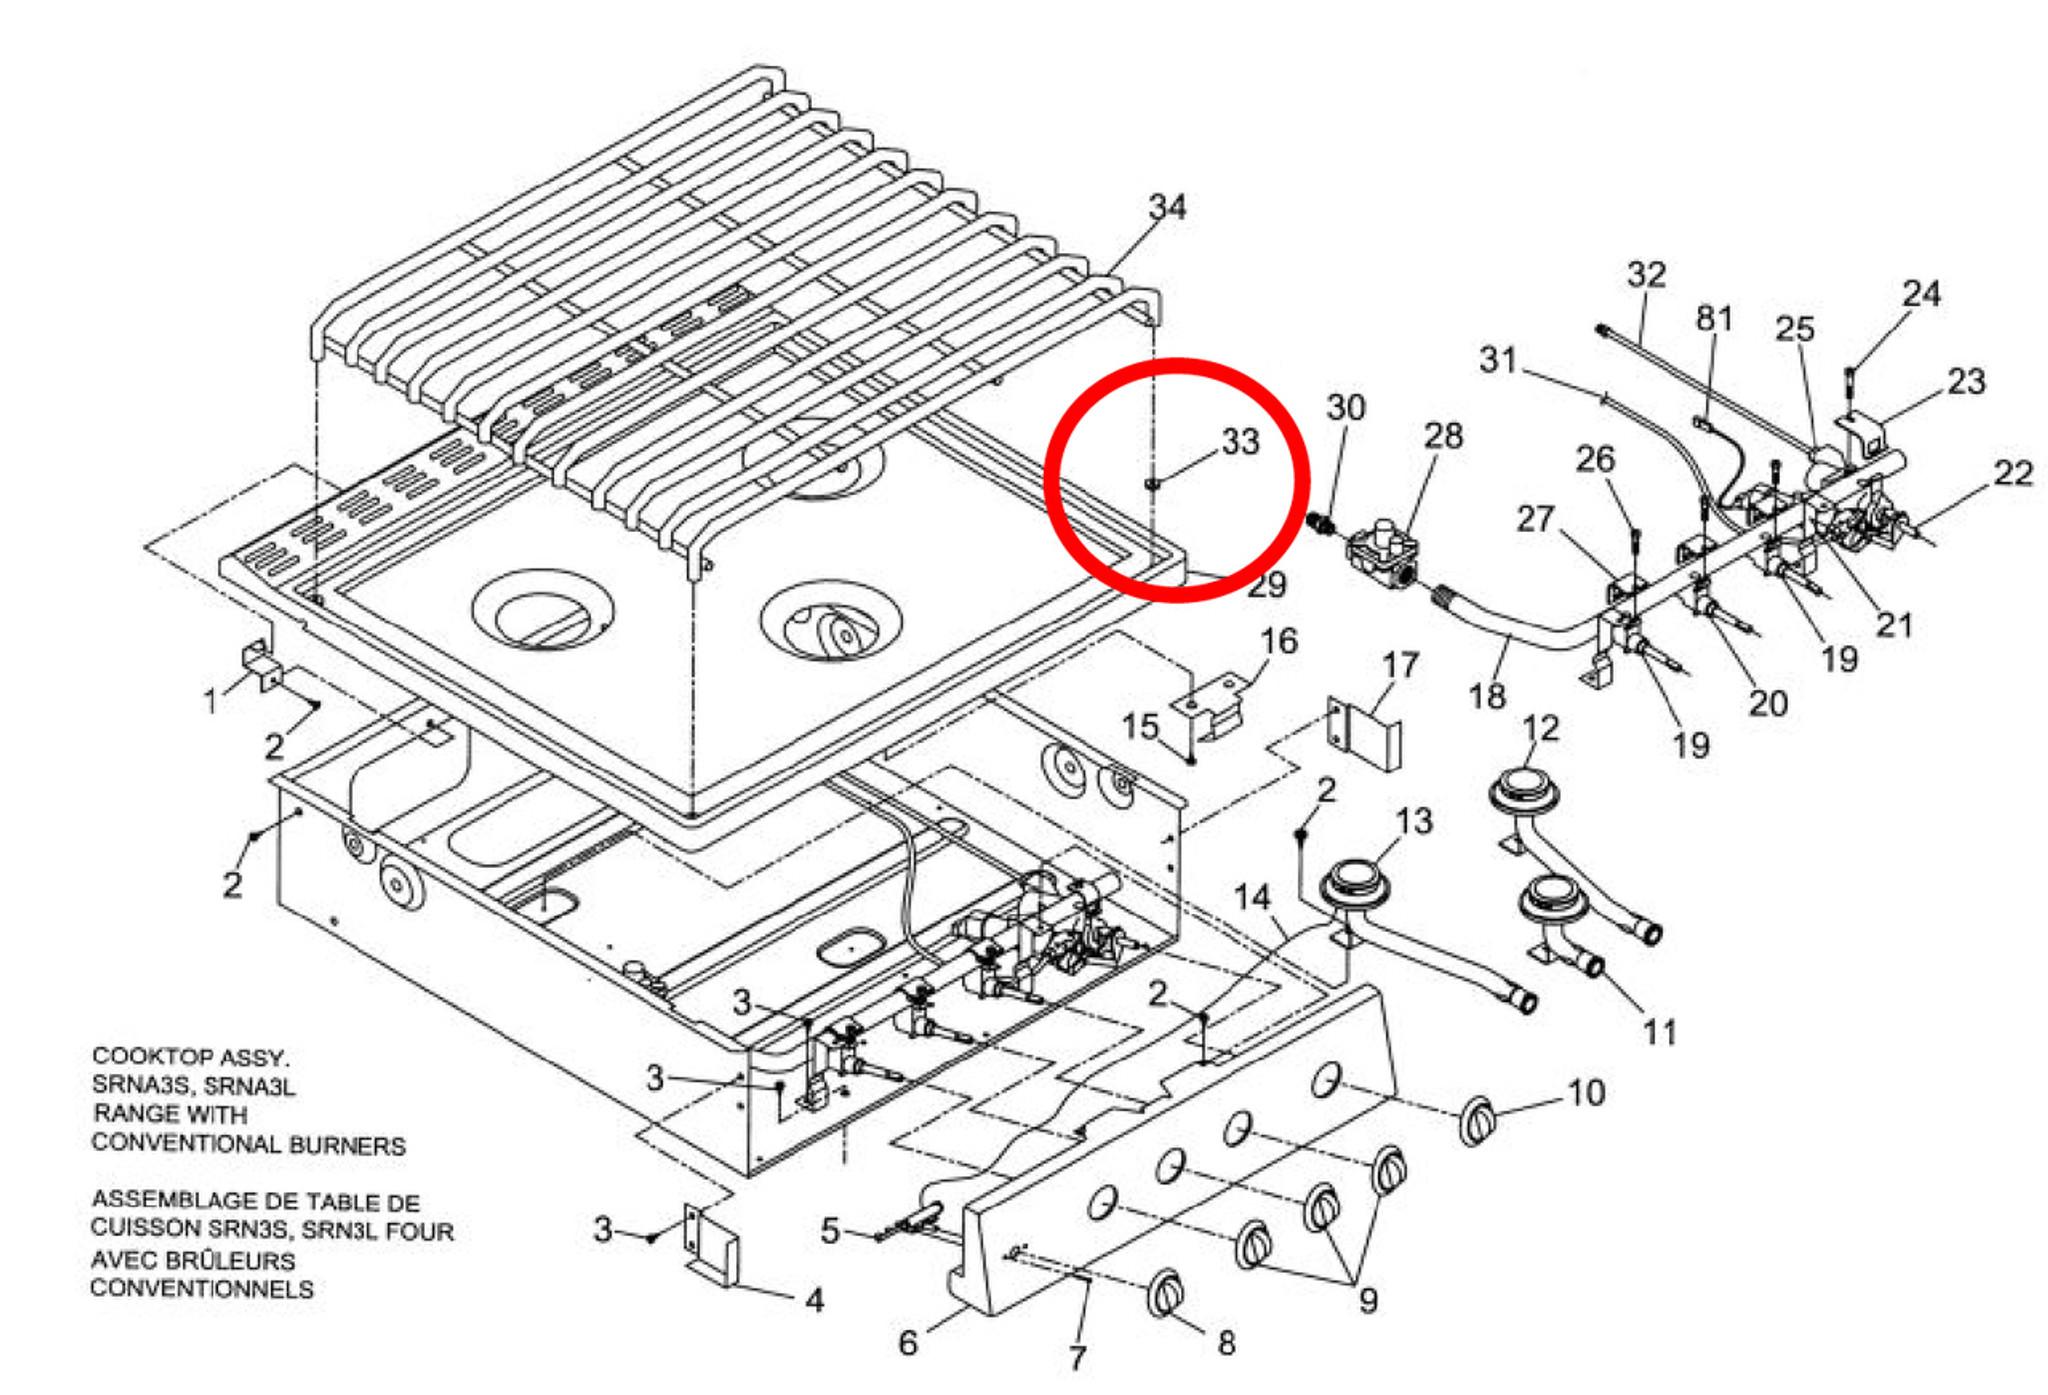 suburban stove grate grommet 071129 fits most models suburban rv rv stove diagram [ 2048 x 1395 Pixel ]